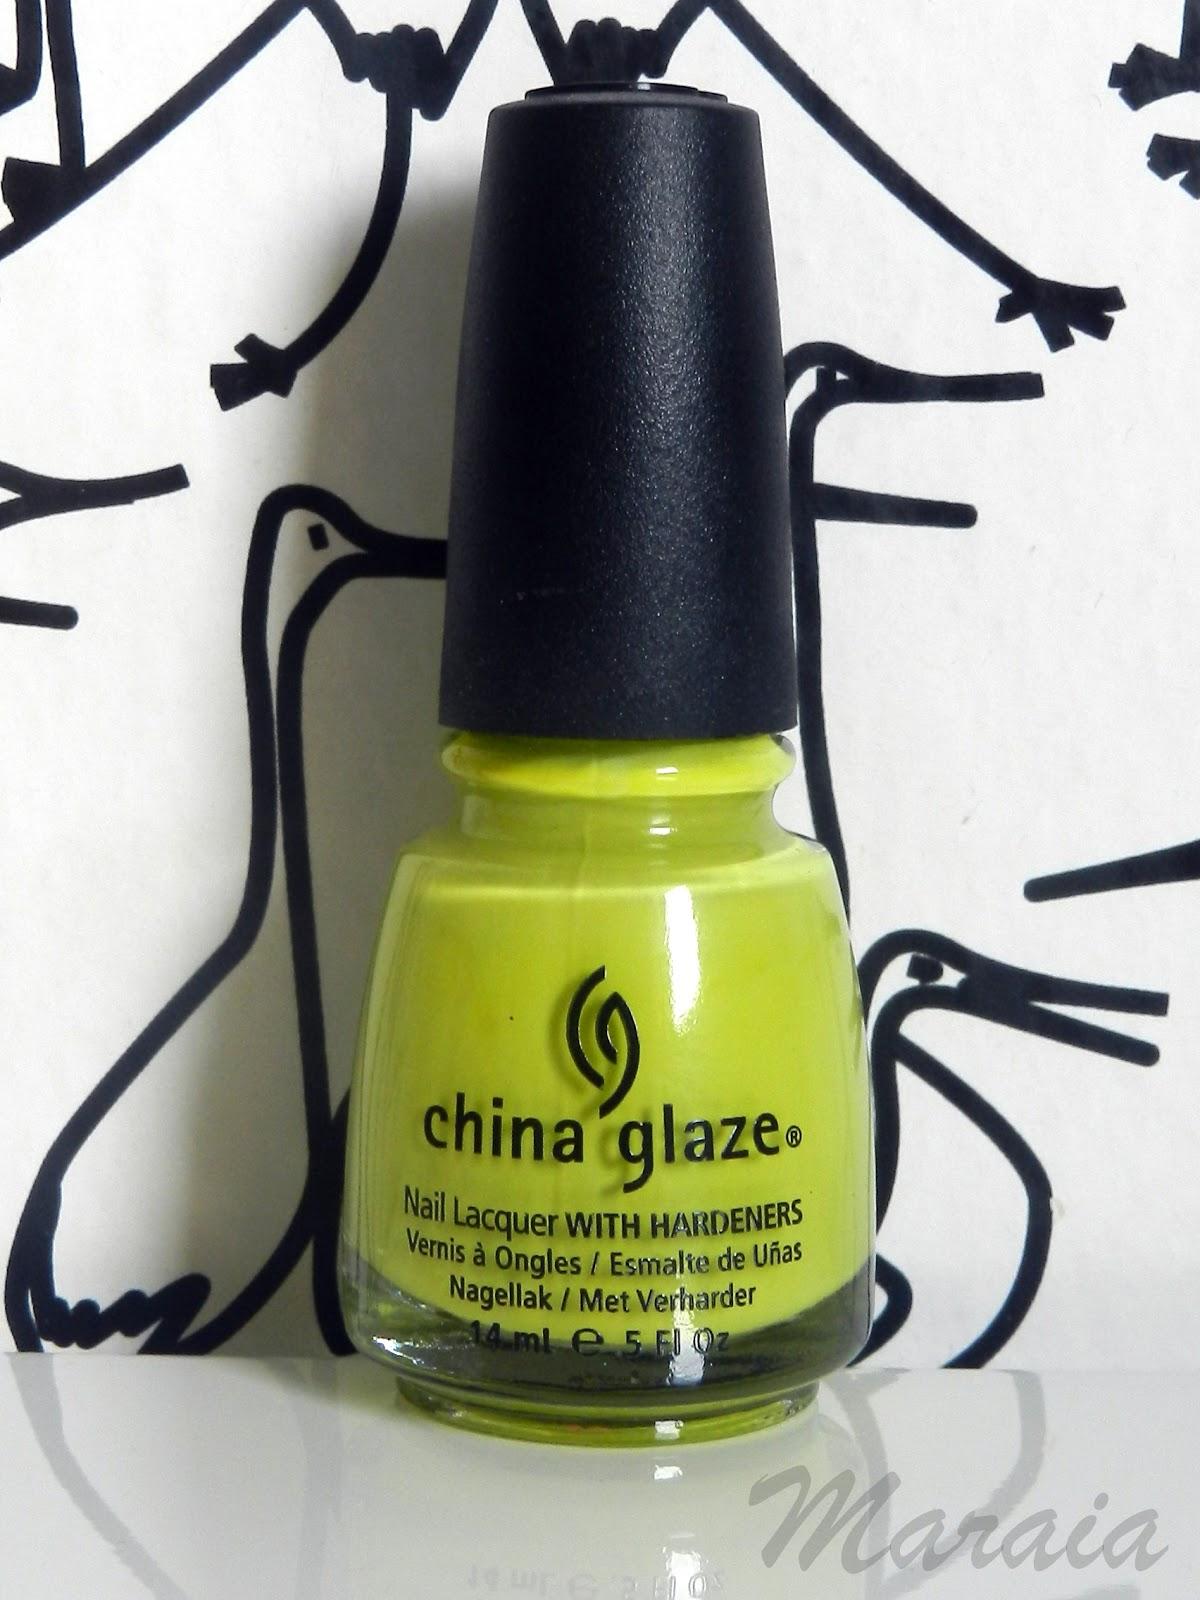 ESMALTES DE UÑAS CHINA GLAZE | Maraia